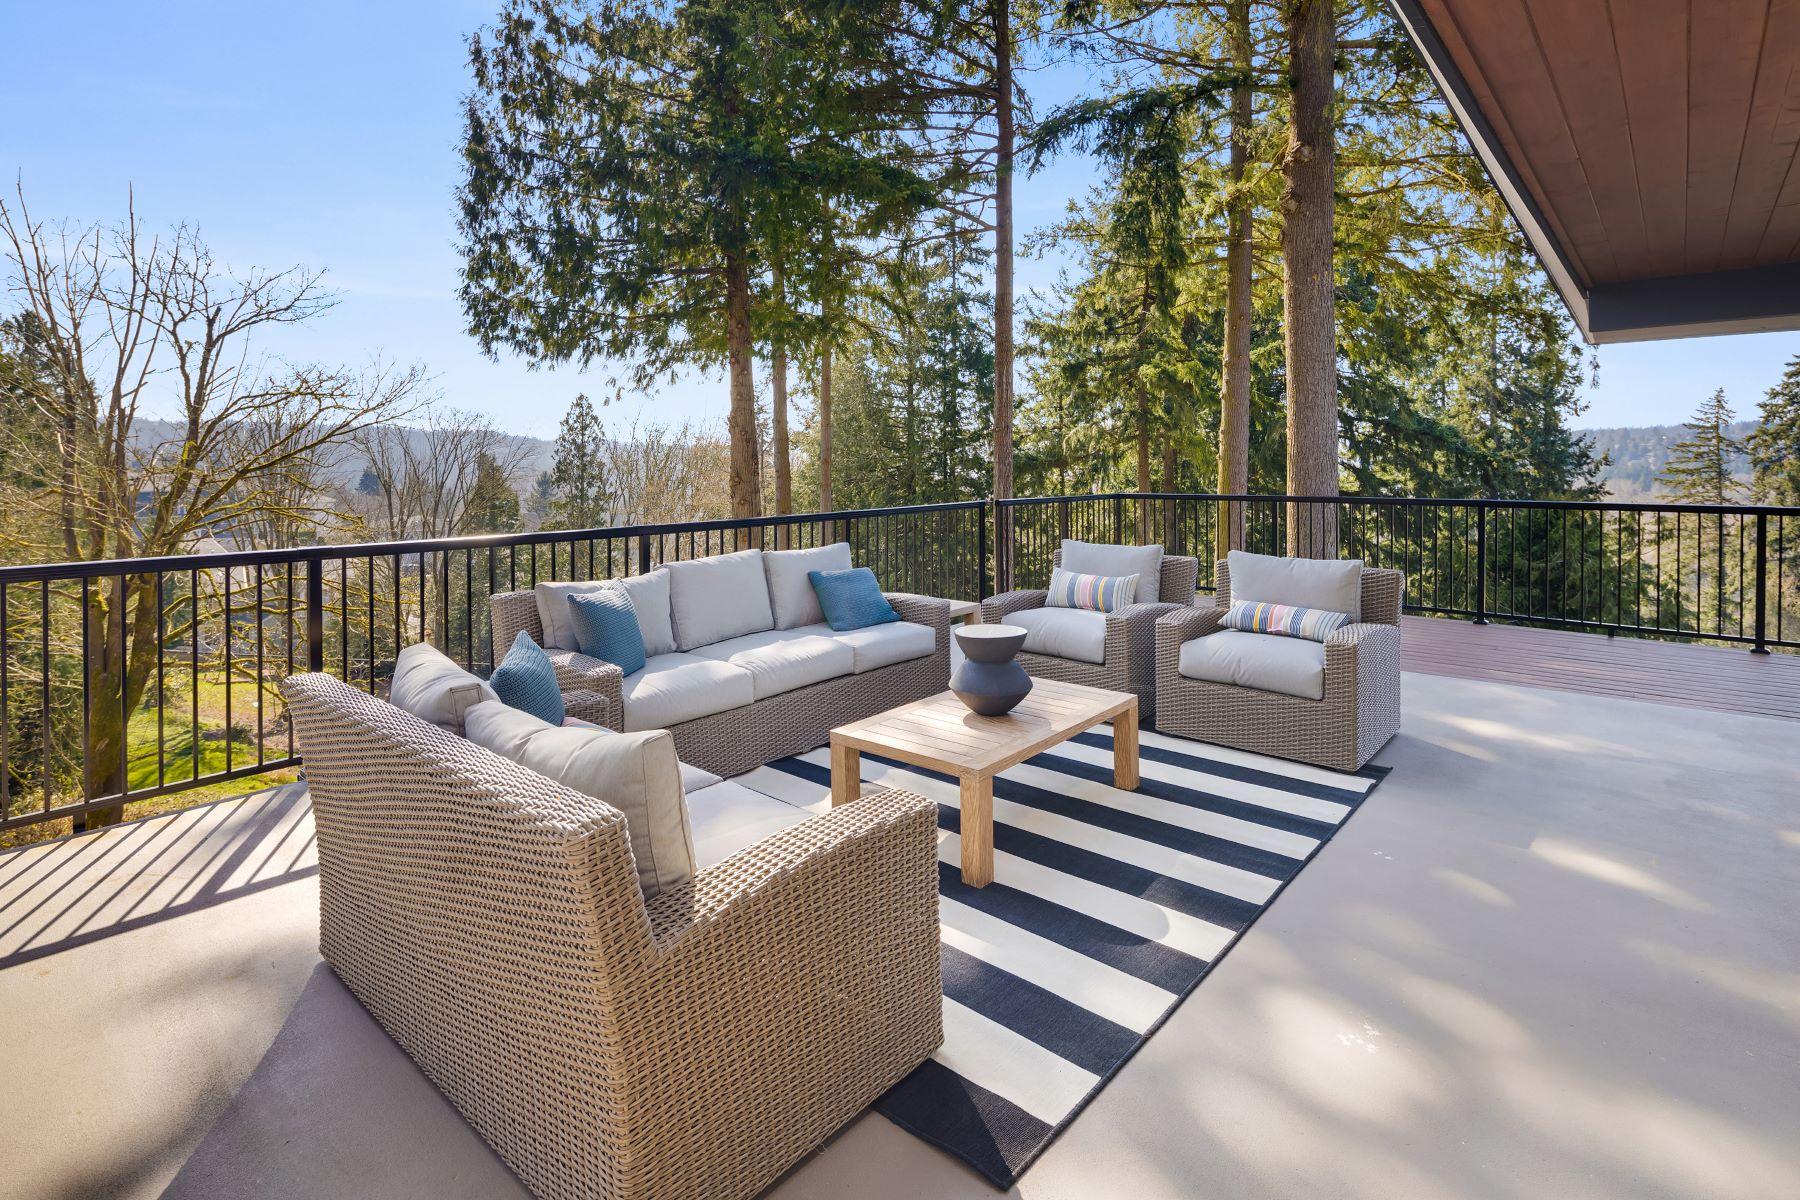 Additional photo for property listing at 8400 NE 190th St, Bothell, WA 98011  Bothell, Washington 98011 Hoa Kỳ